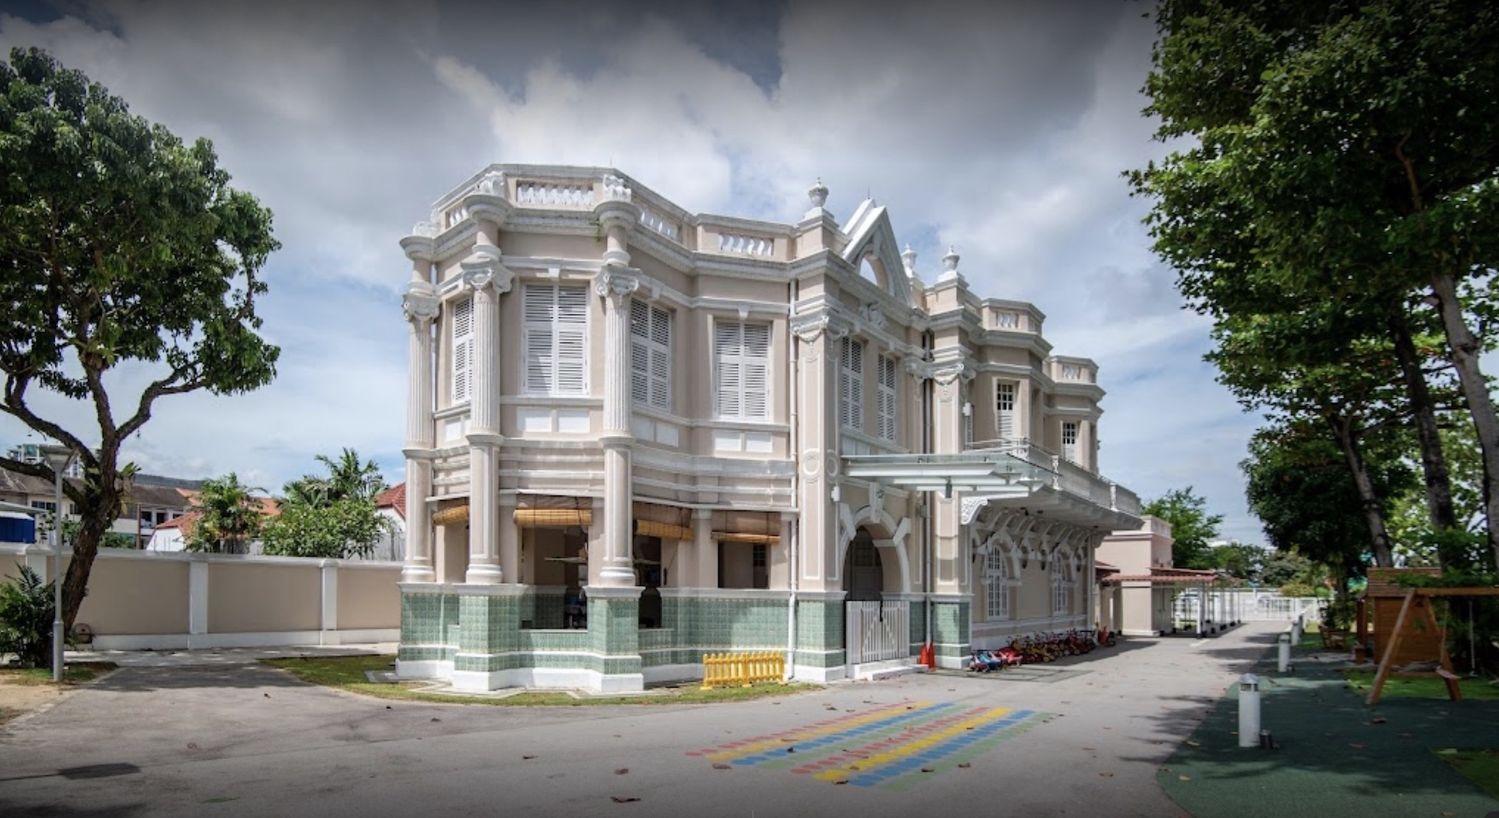 SCHOOLHOUSE KATONG 26 STILL RD SOUTH - EDGEPROP SINGAPORE